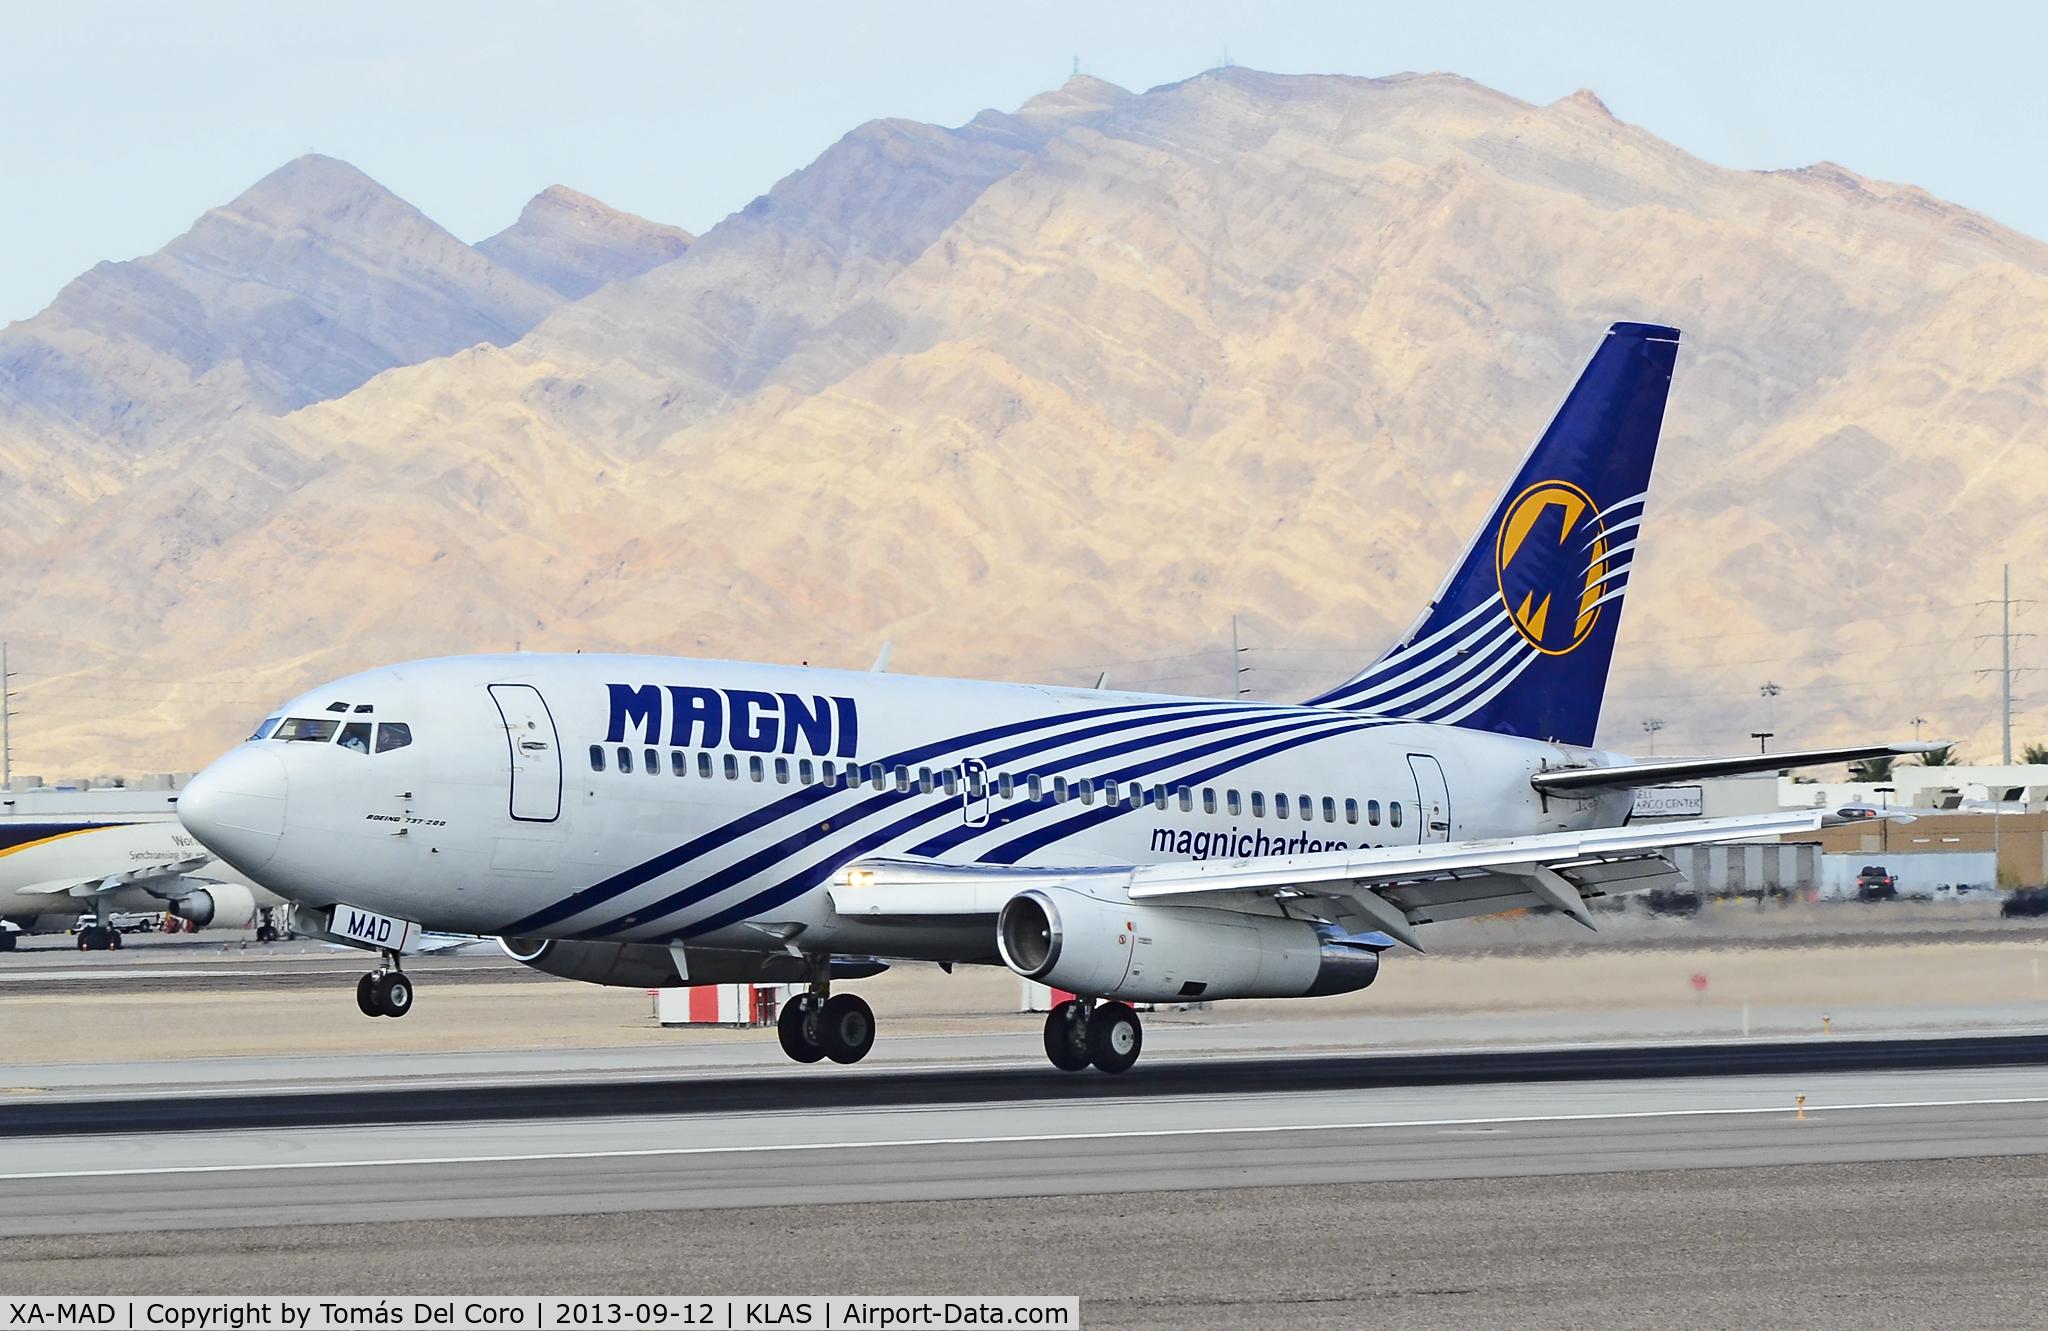 XA-MAD, 1982 Boeing 737-277 C/N 22652, XA-MAD Magnicharters Boeing 737-277/Adv (cn 22652/831)  McCarran International Airport (KLAS) TDelCoro September 12, 2013